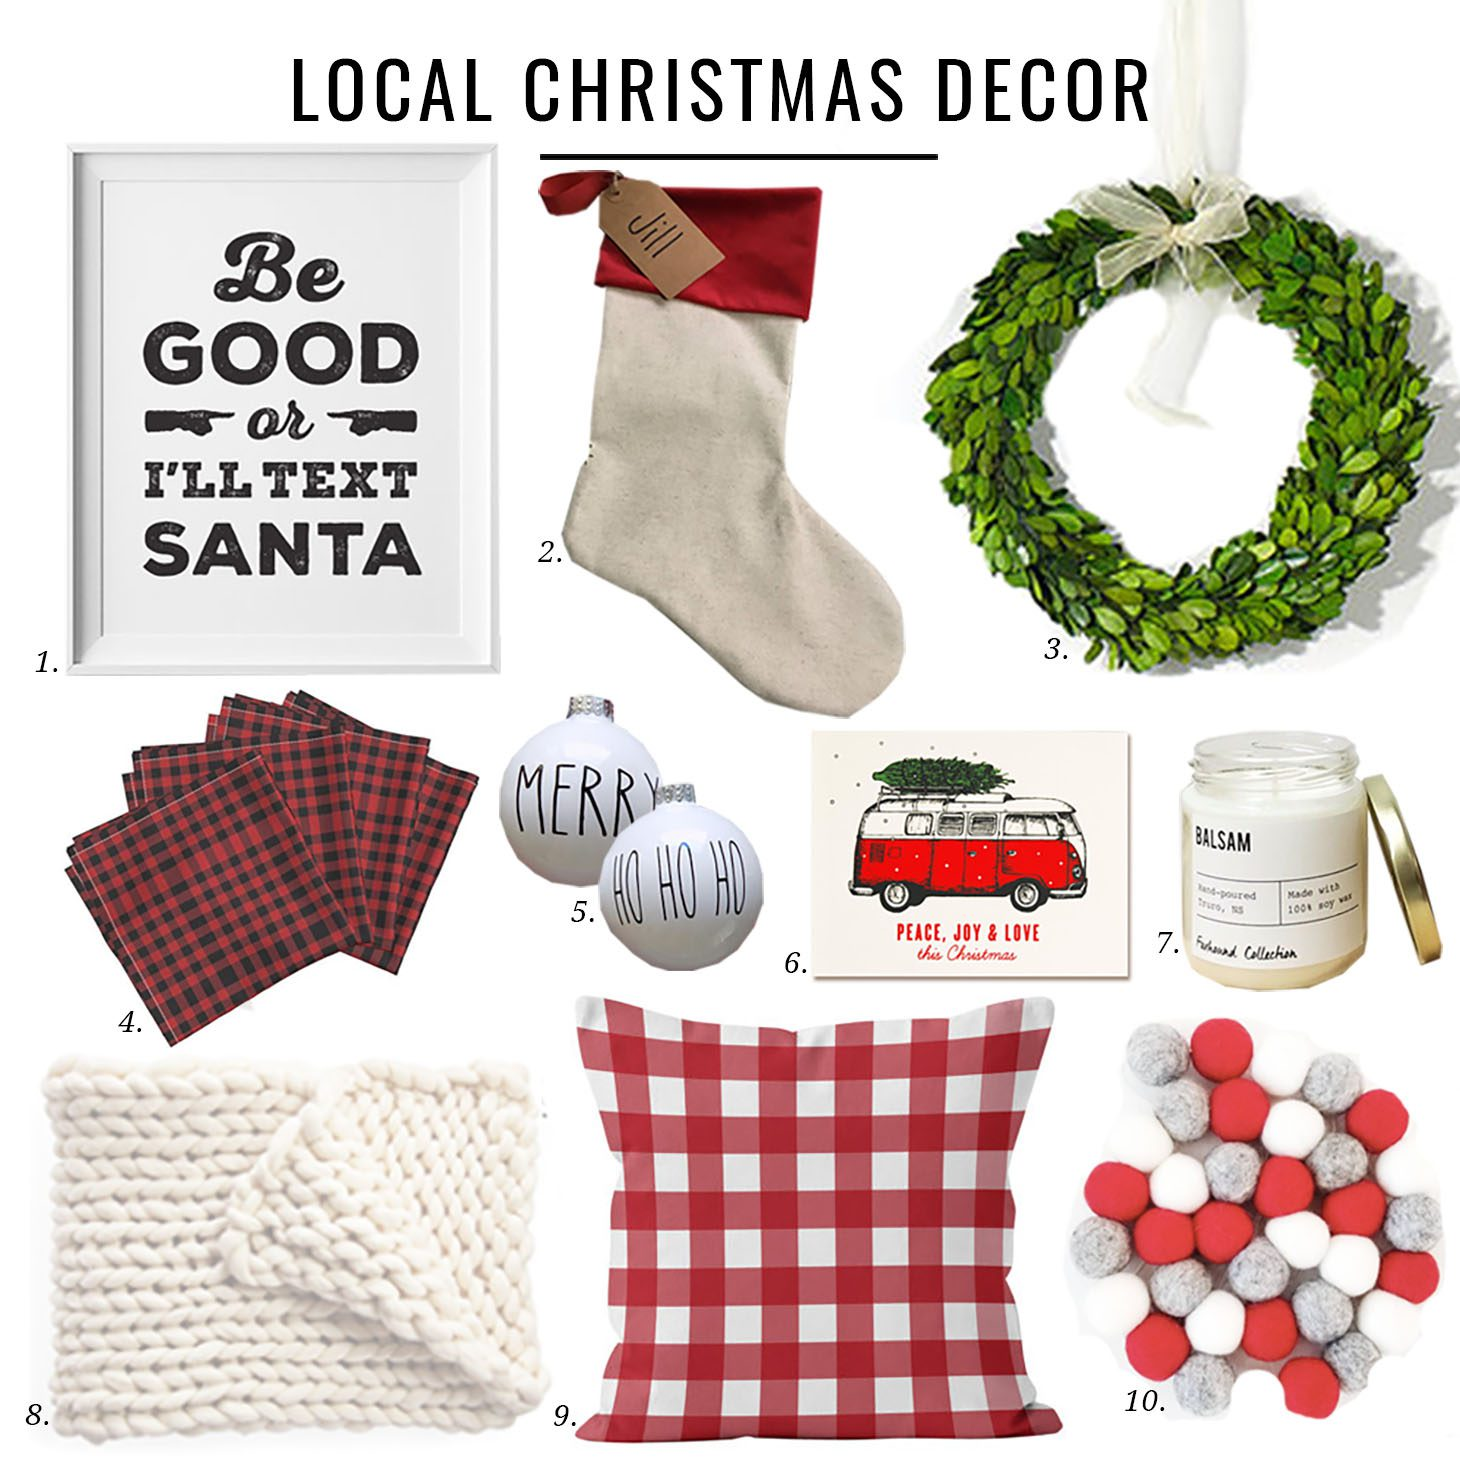 Local Christmas Decor